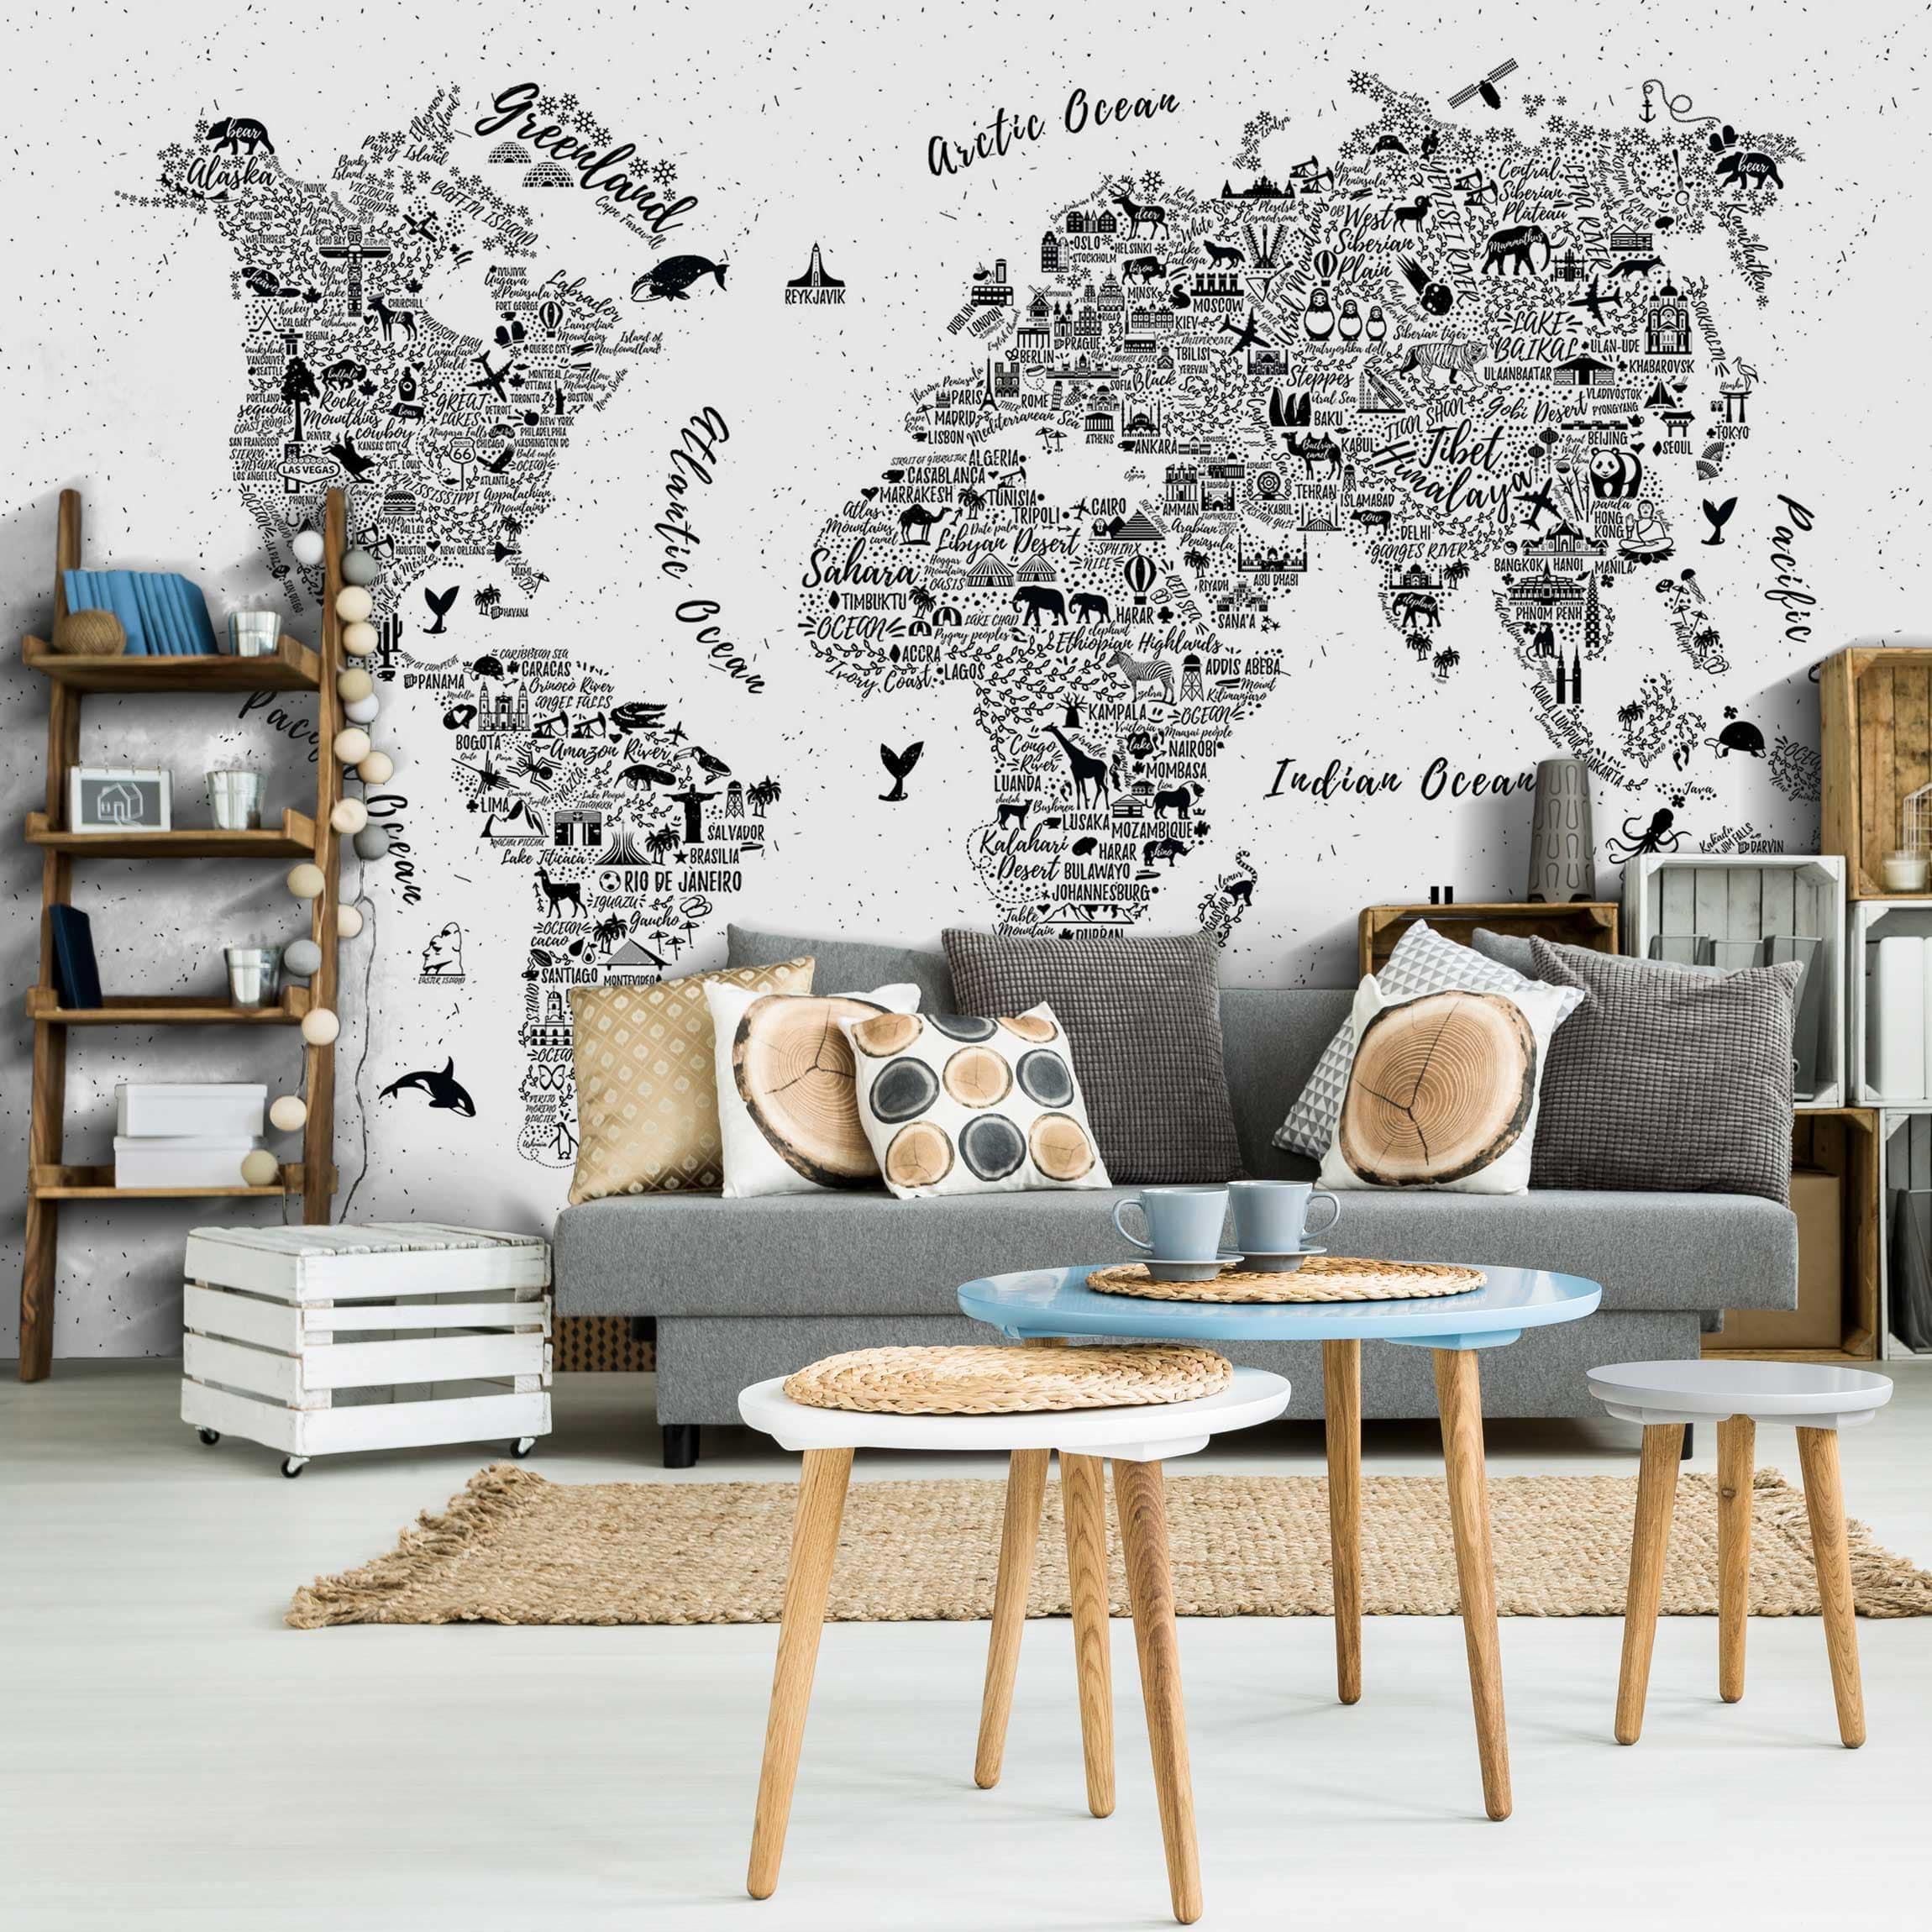 tapete selbstklebend typografie weltkarte wei wandbild querformat. Black Bedroom Furniture Sets. Home Design Ideas